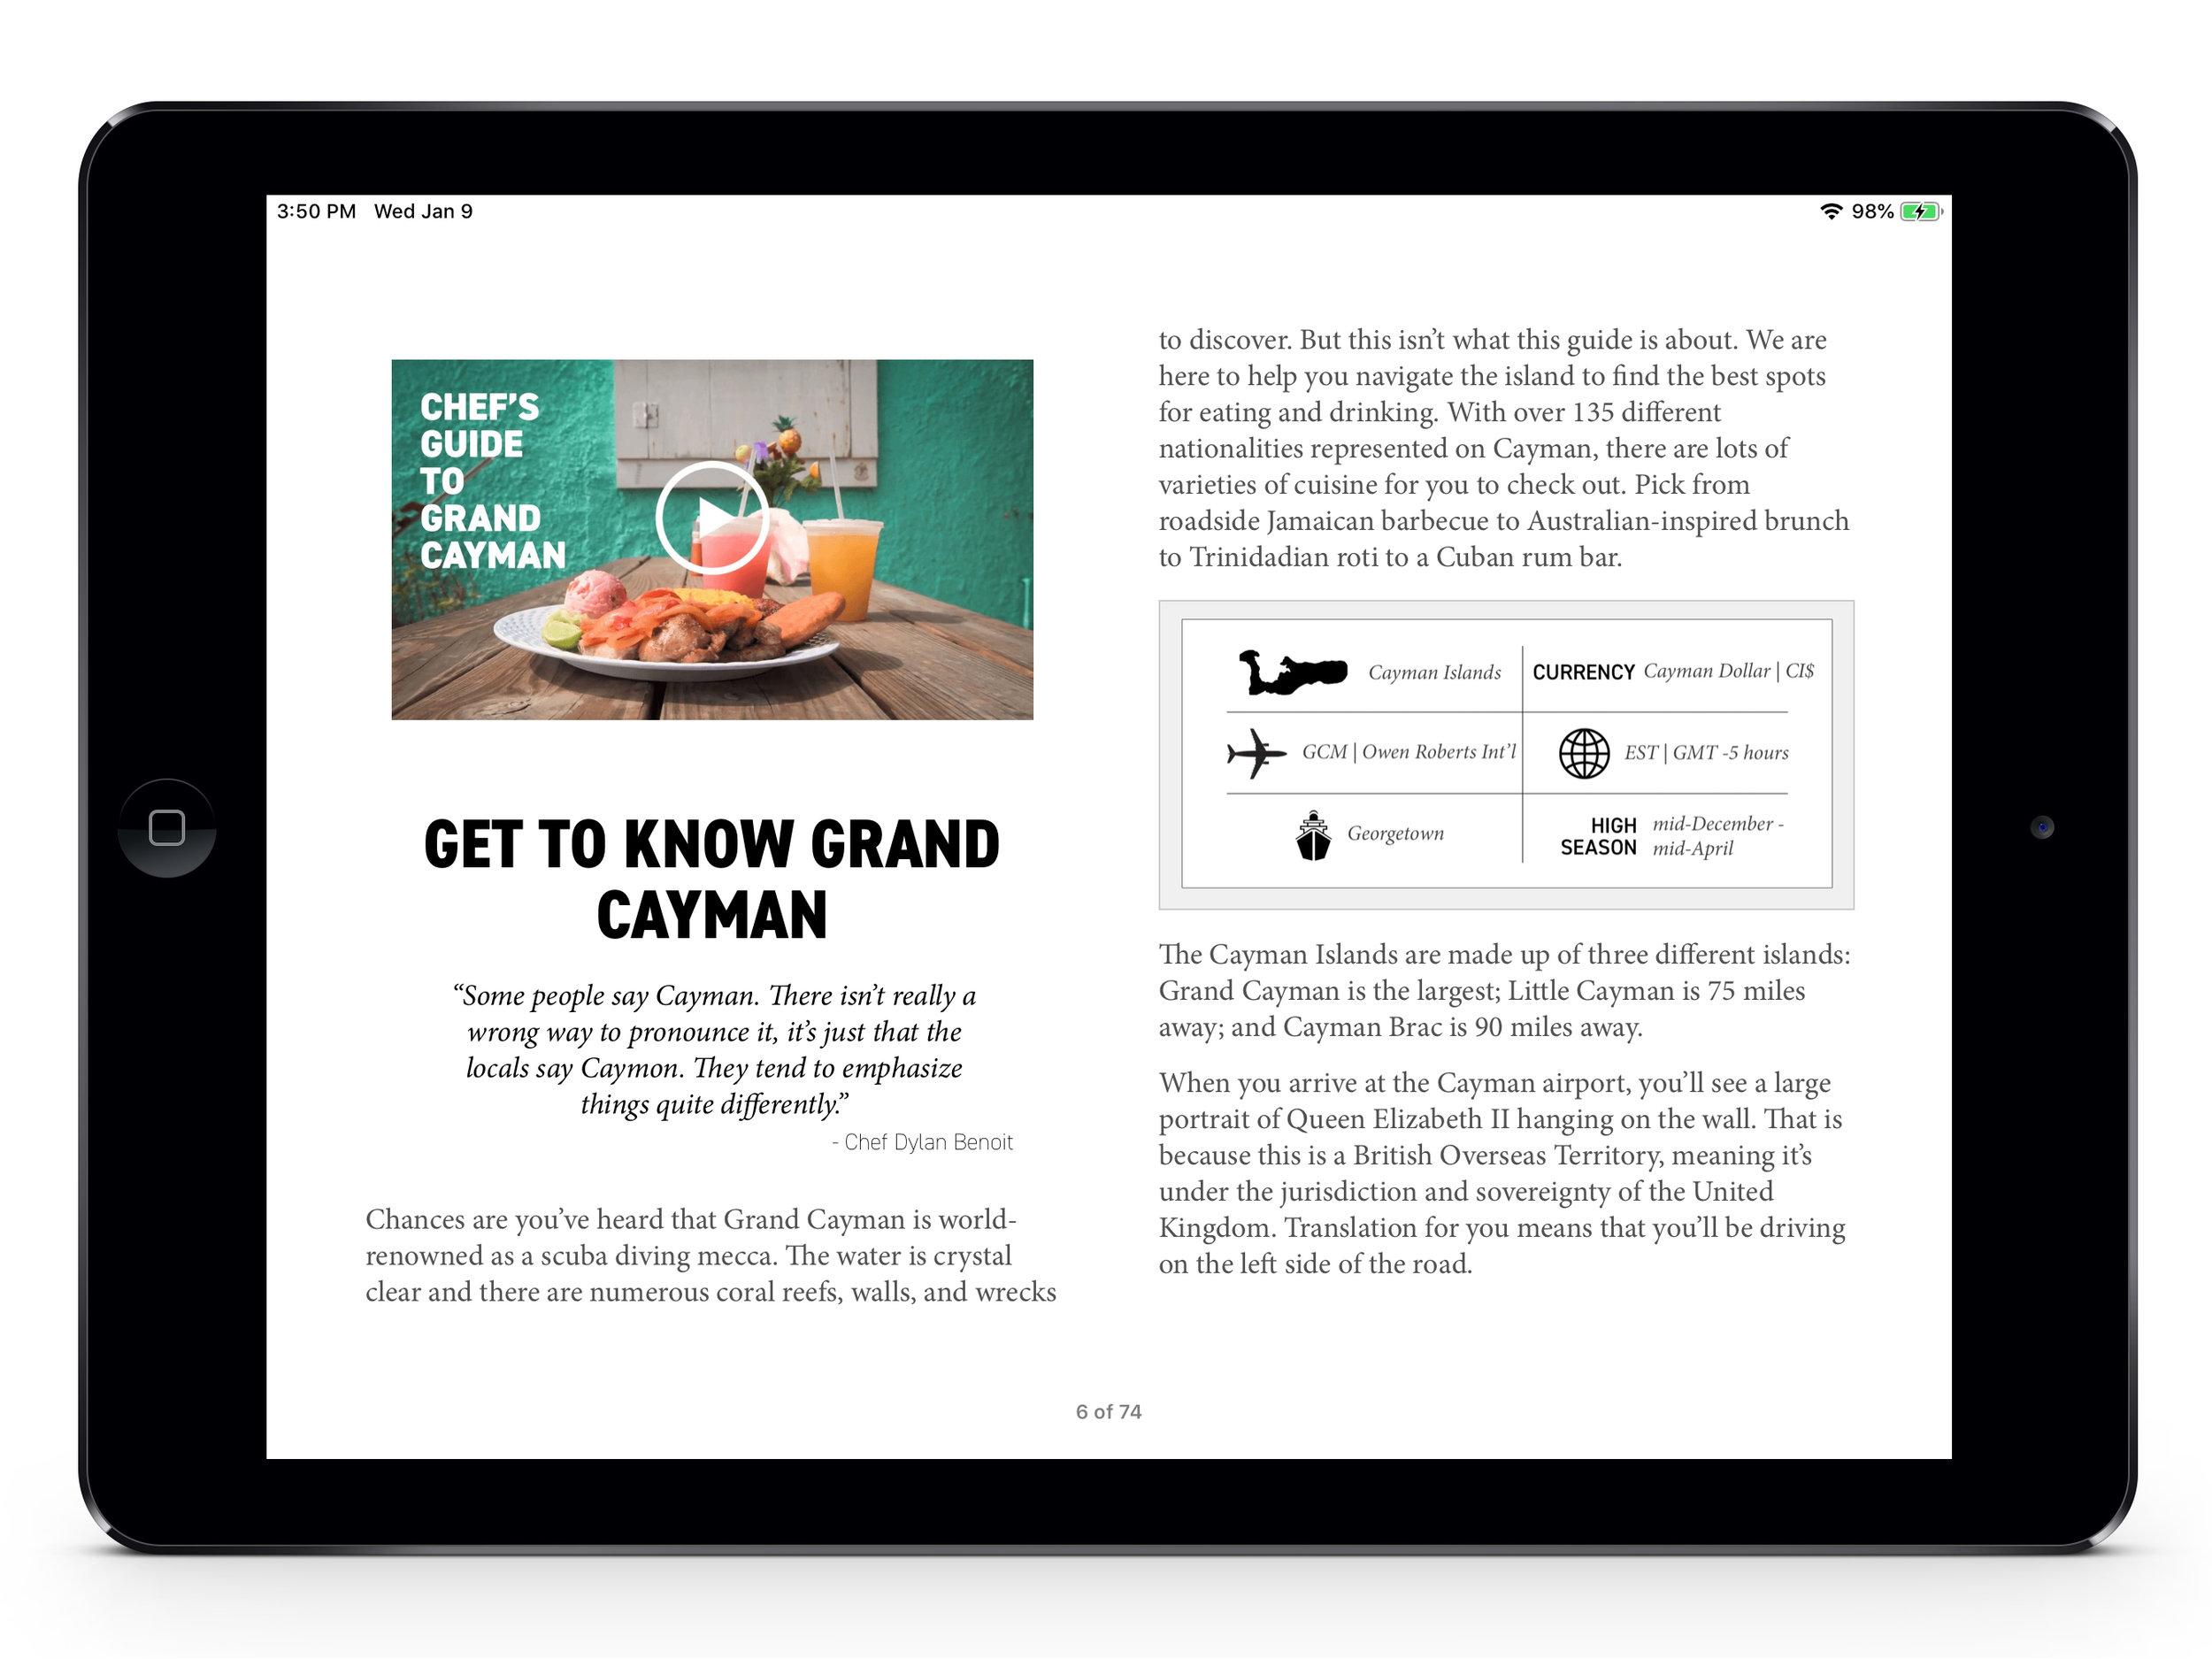 iPadAir_GrandCayman_Screenshots_Landscape_1.3.jpg